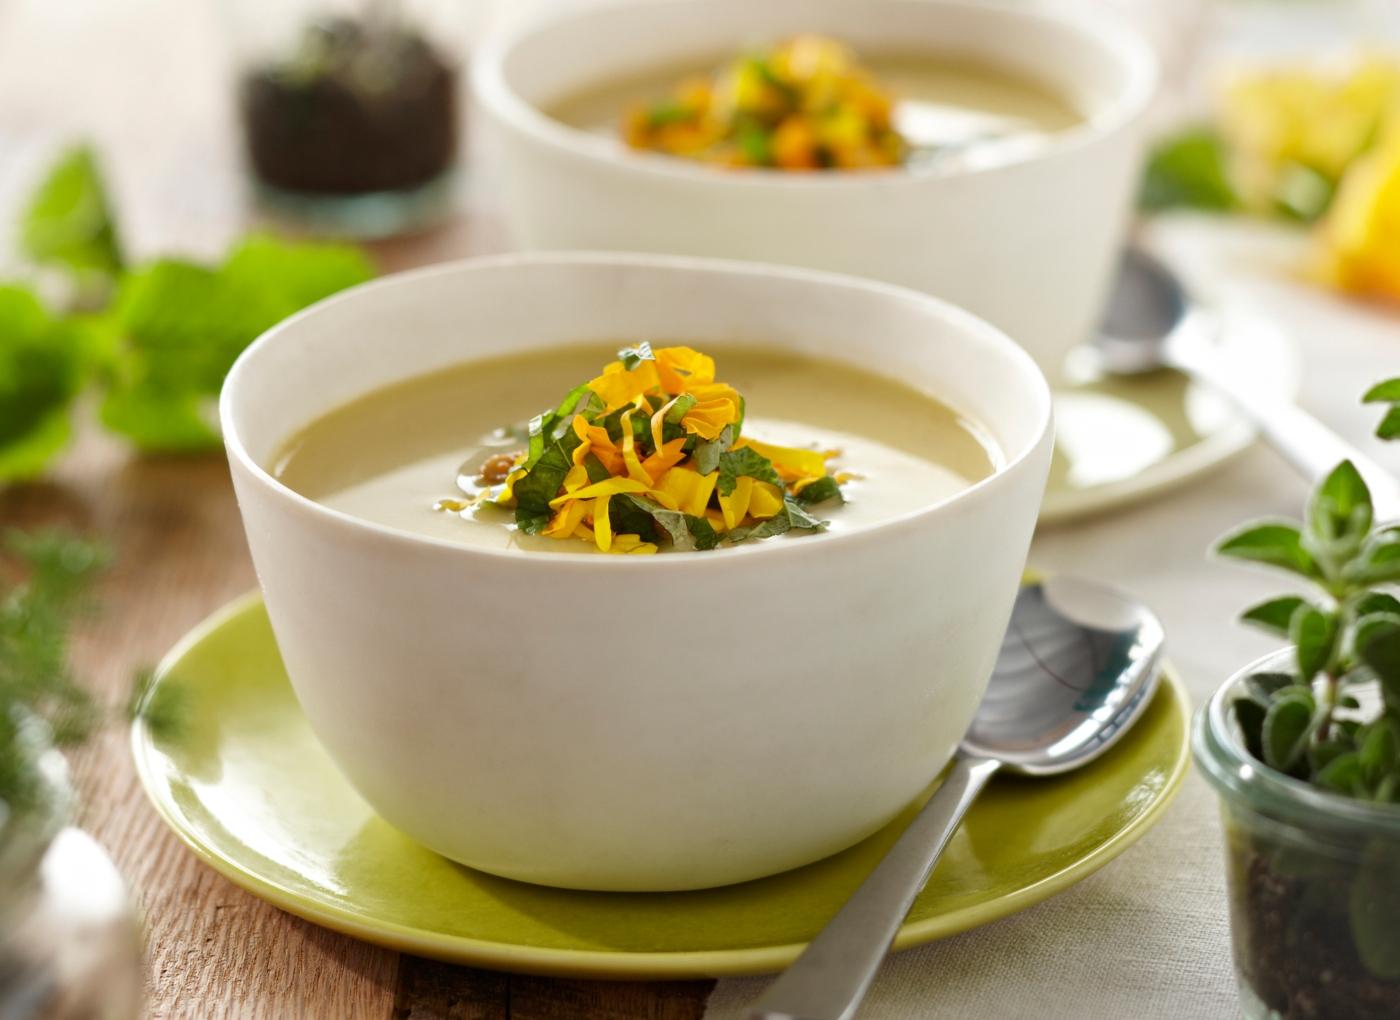 Quanto tempo aguenta a sopa no frigorífico: sopa de legumes